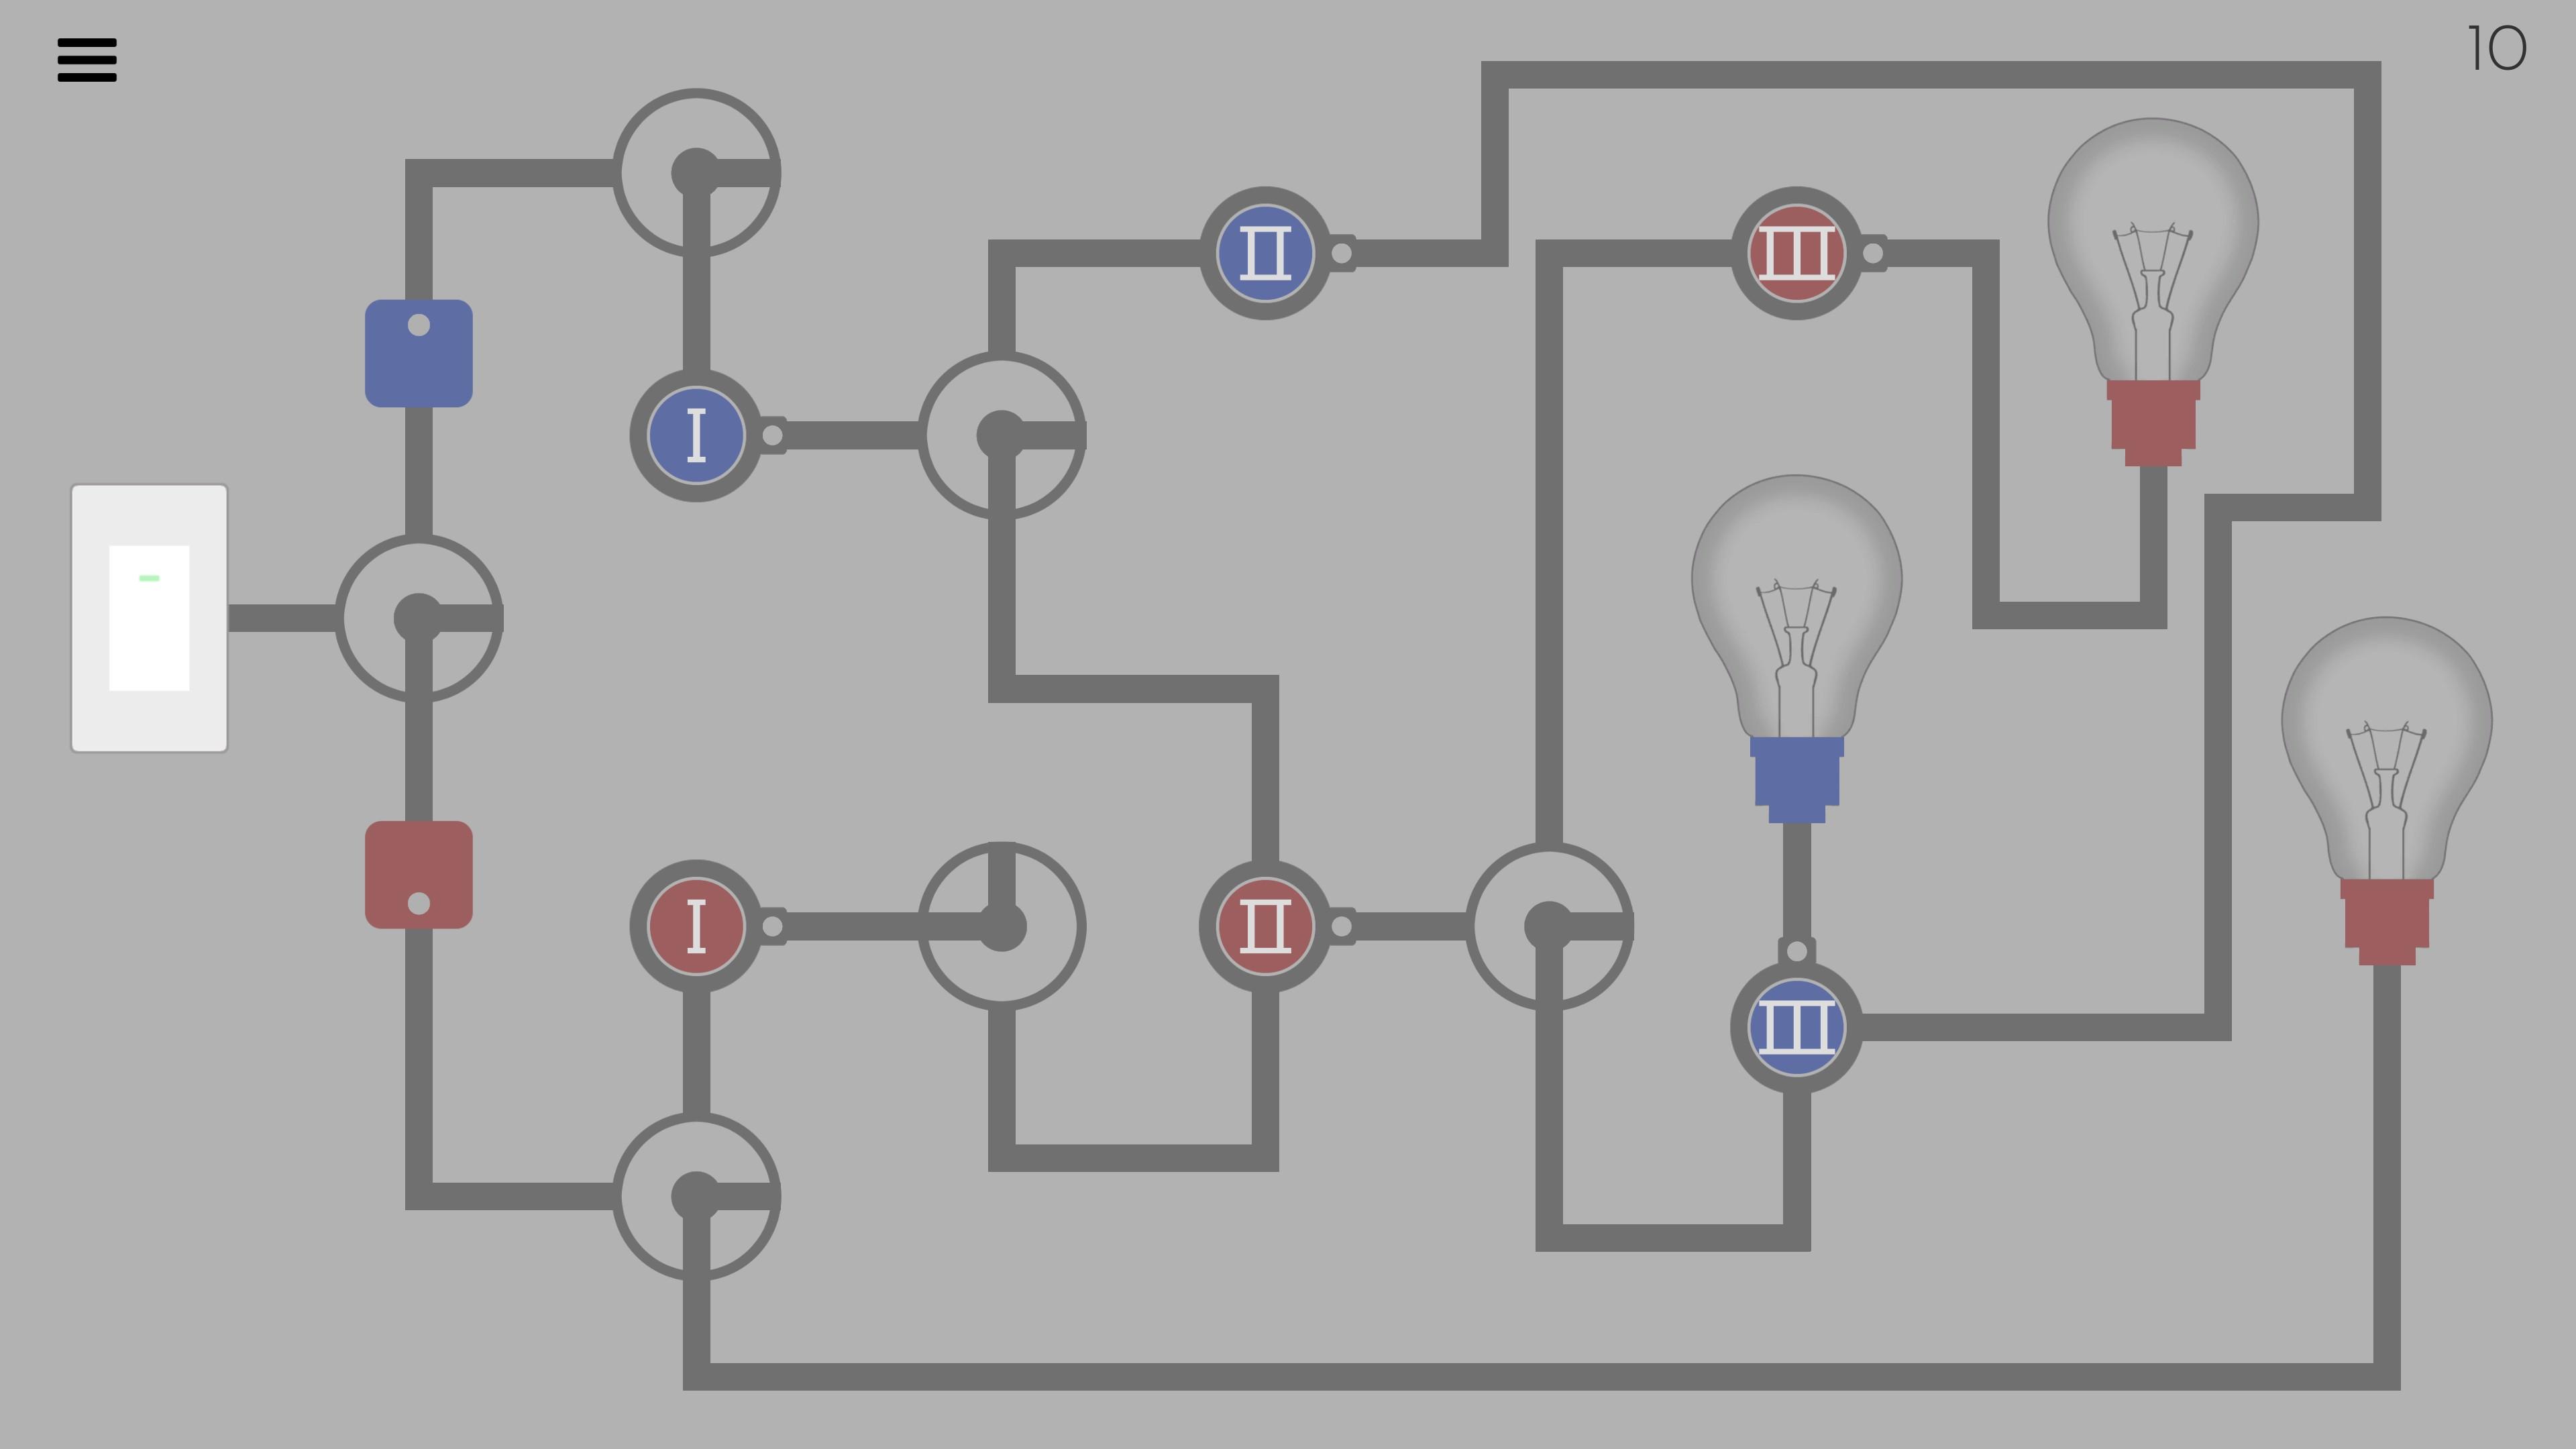 Turn on all the lights game screenshot.